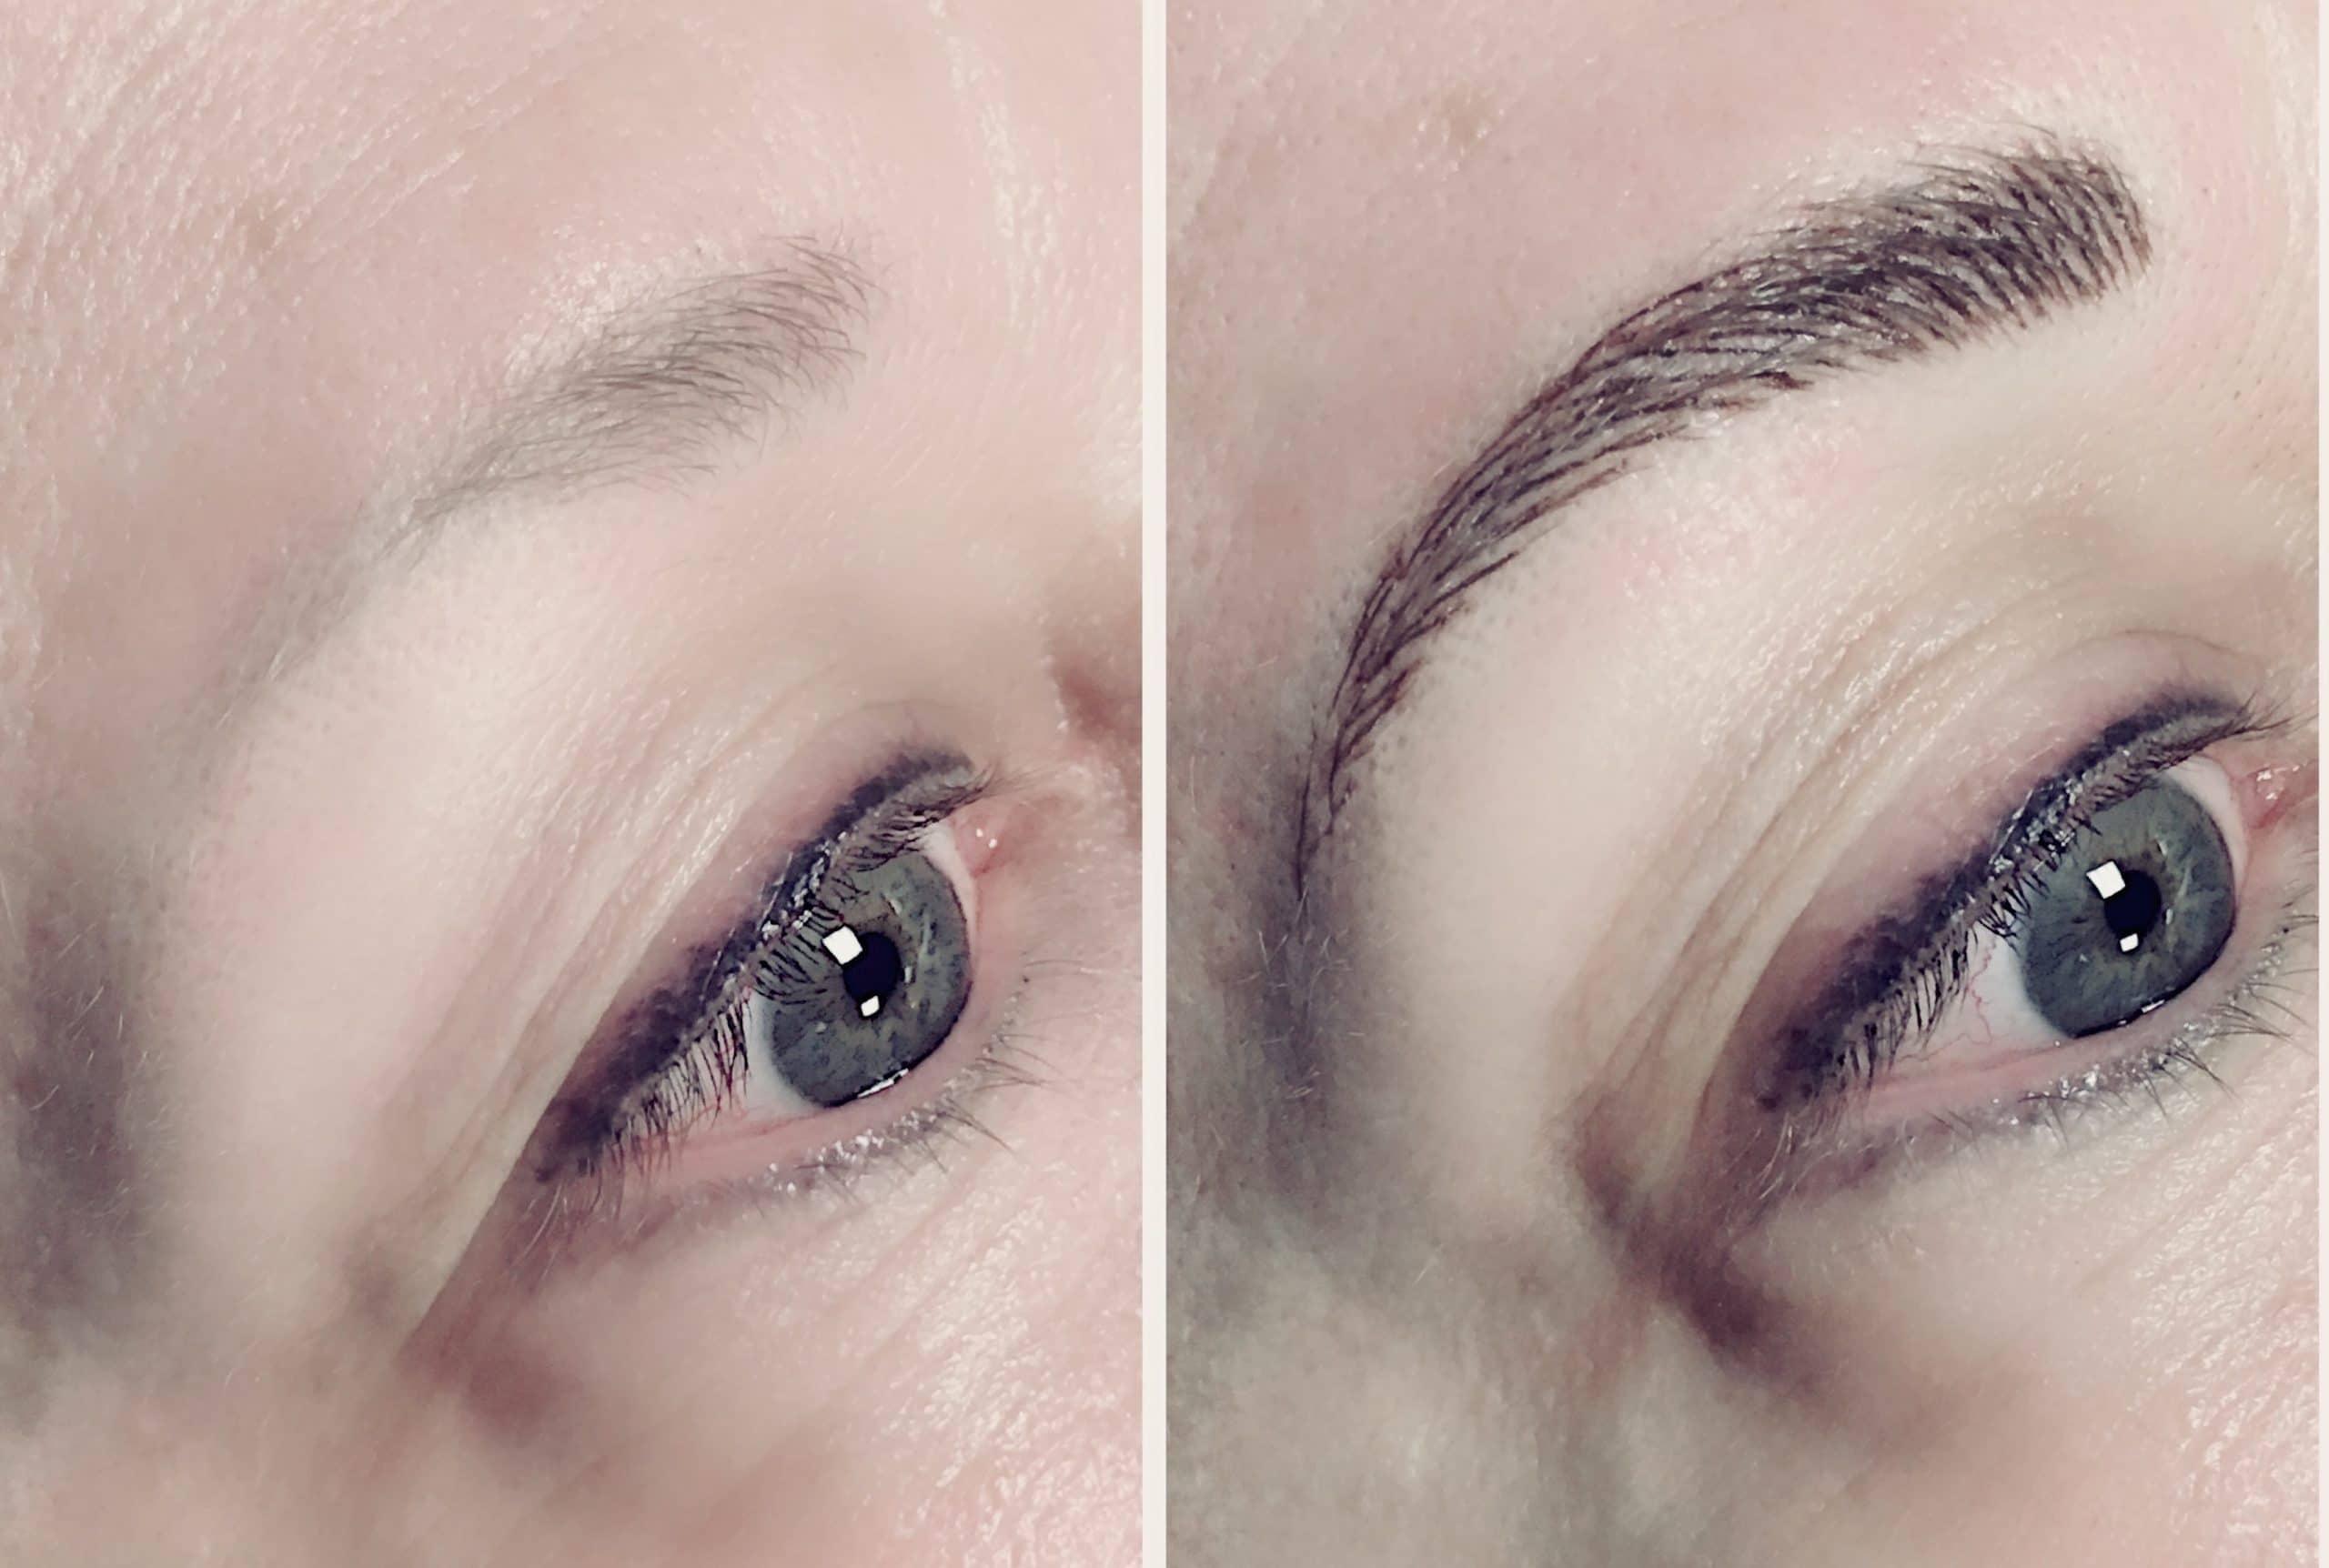 microblading-brows-permanent-makeup-skin-apeel-boca-raton-phibrow-